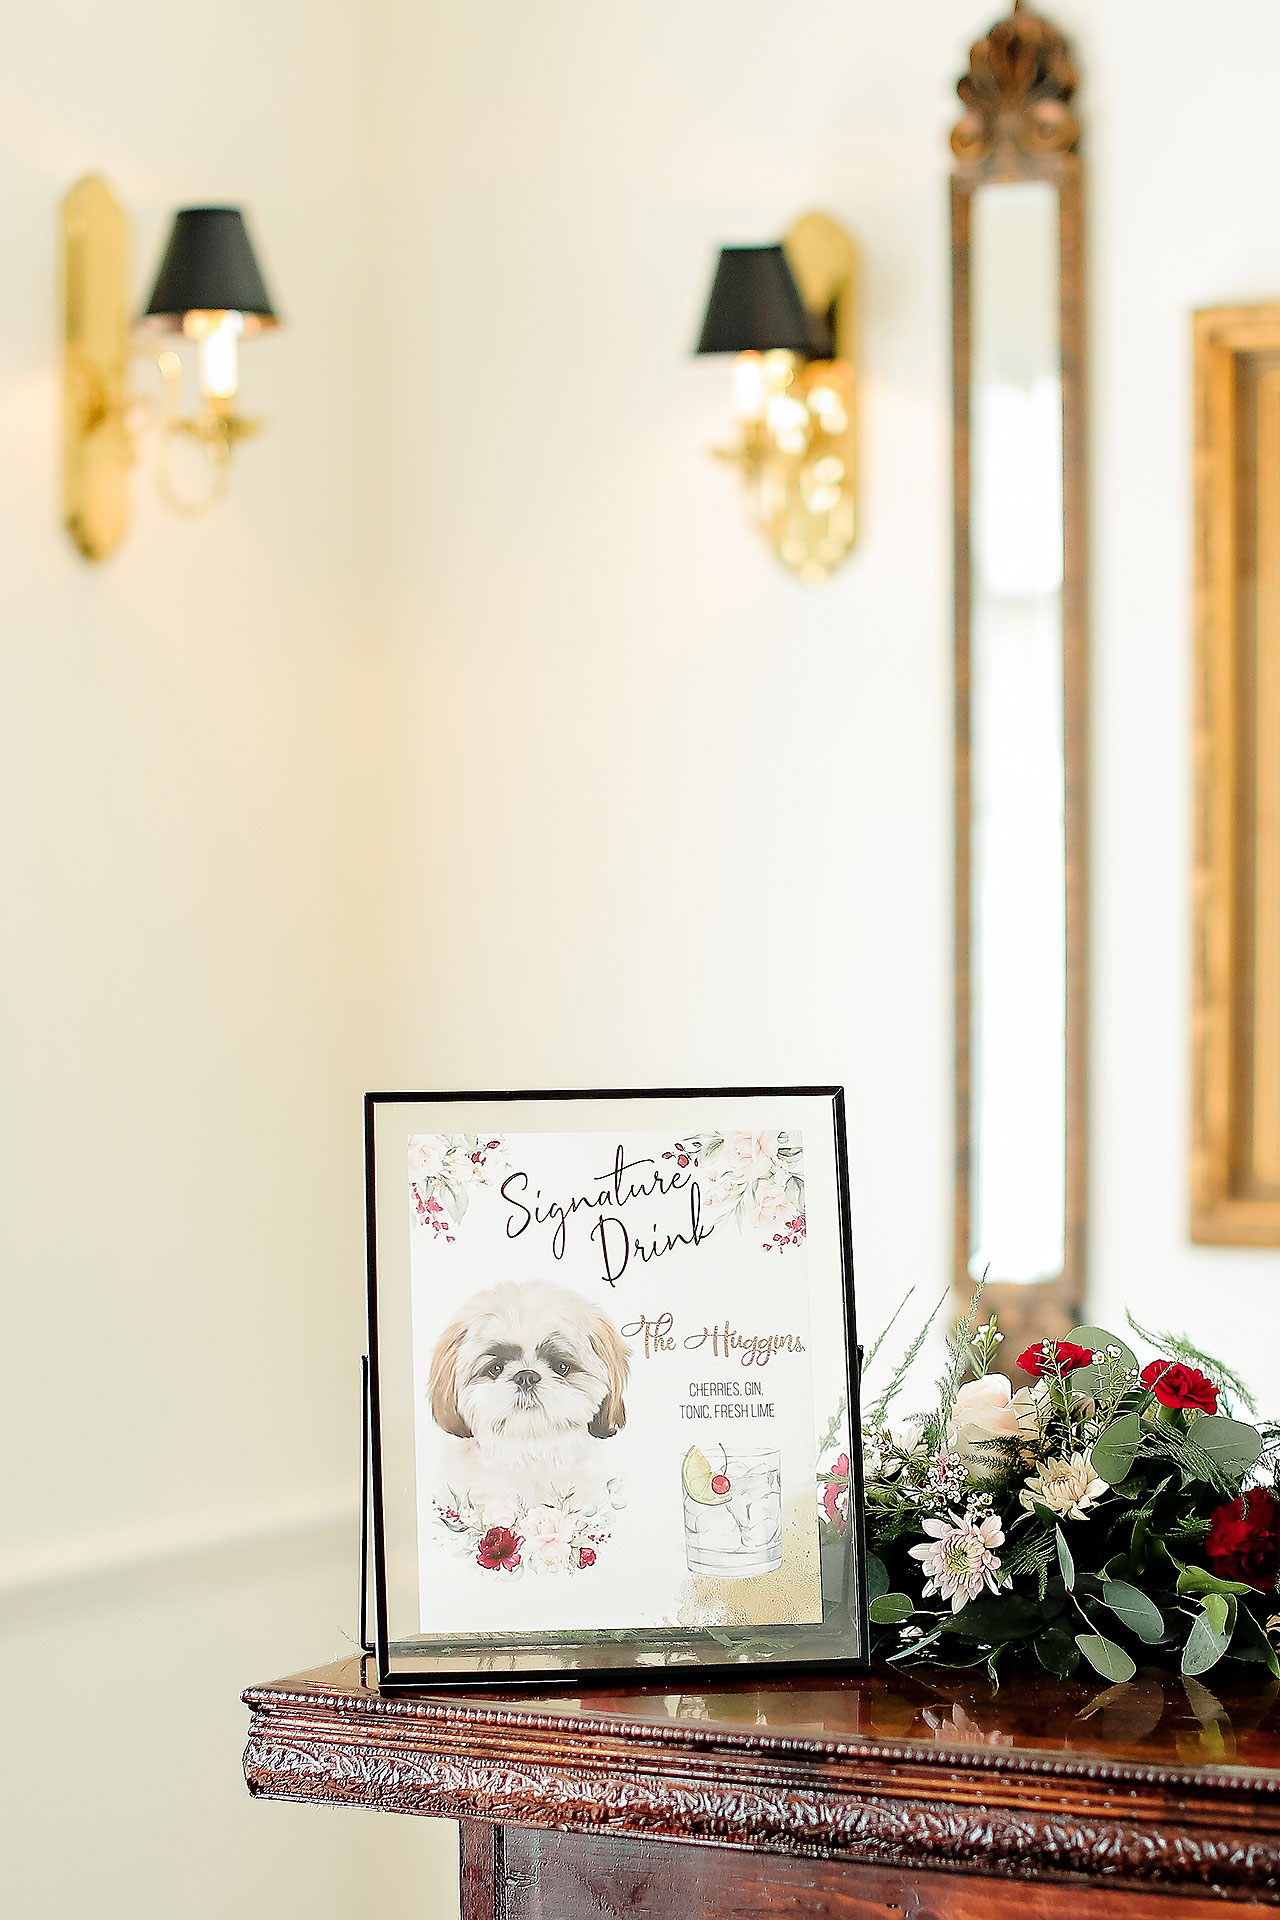 Nadia Parker Black Iris Estate Carmel Indiana Wedding May 2021 197